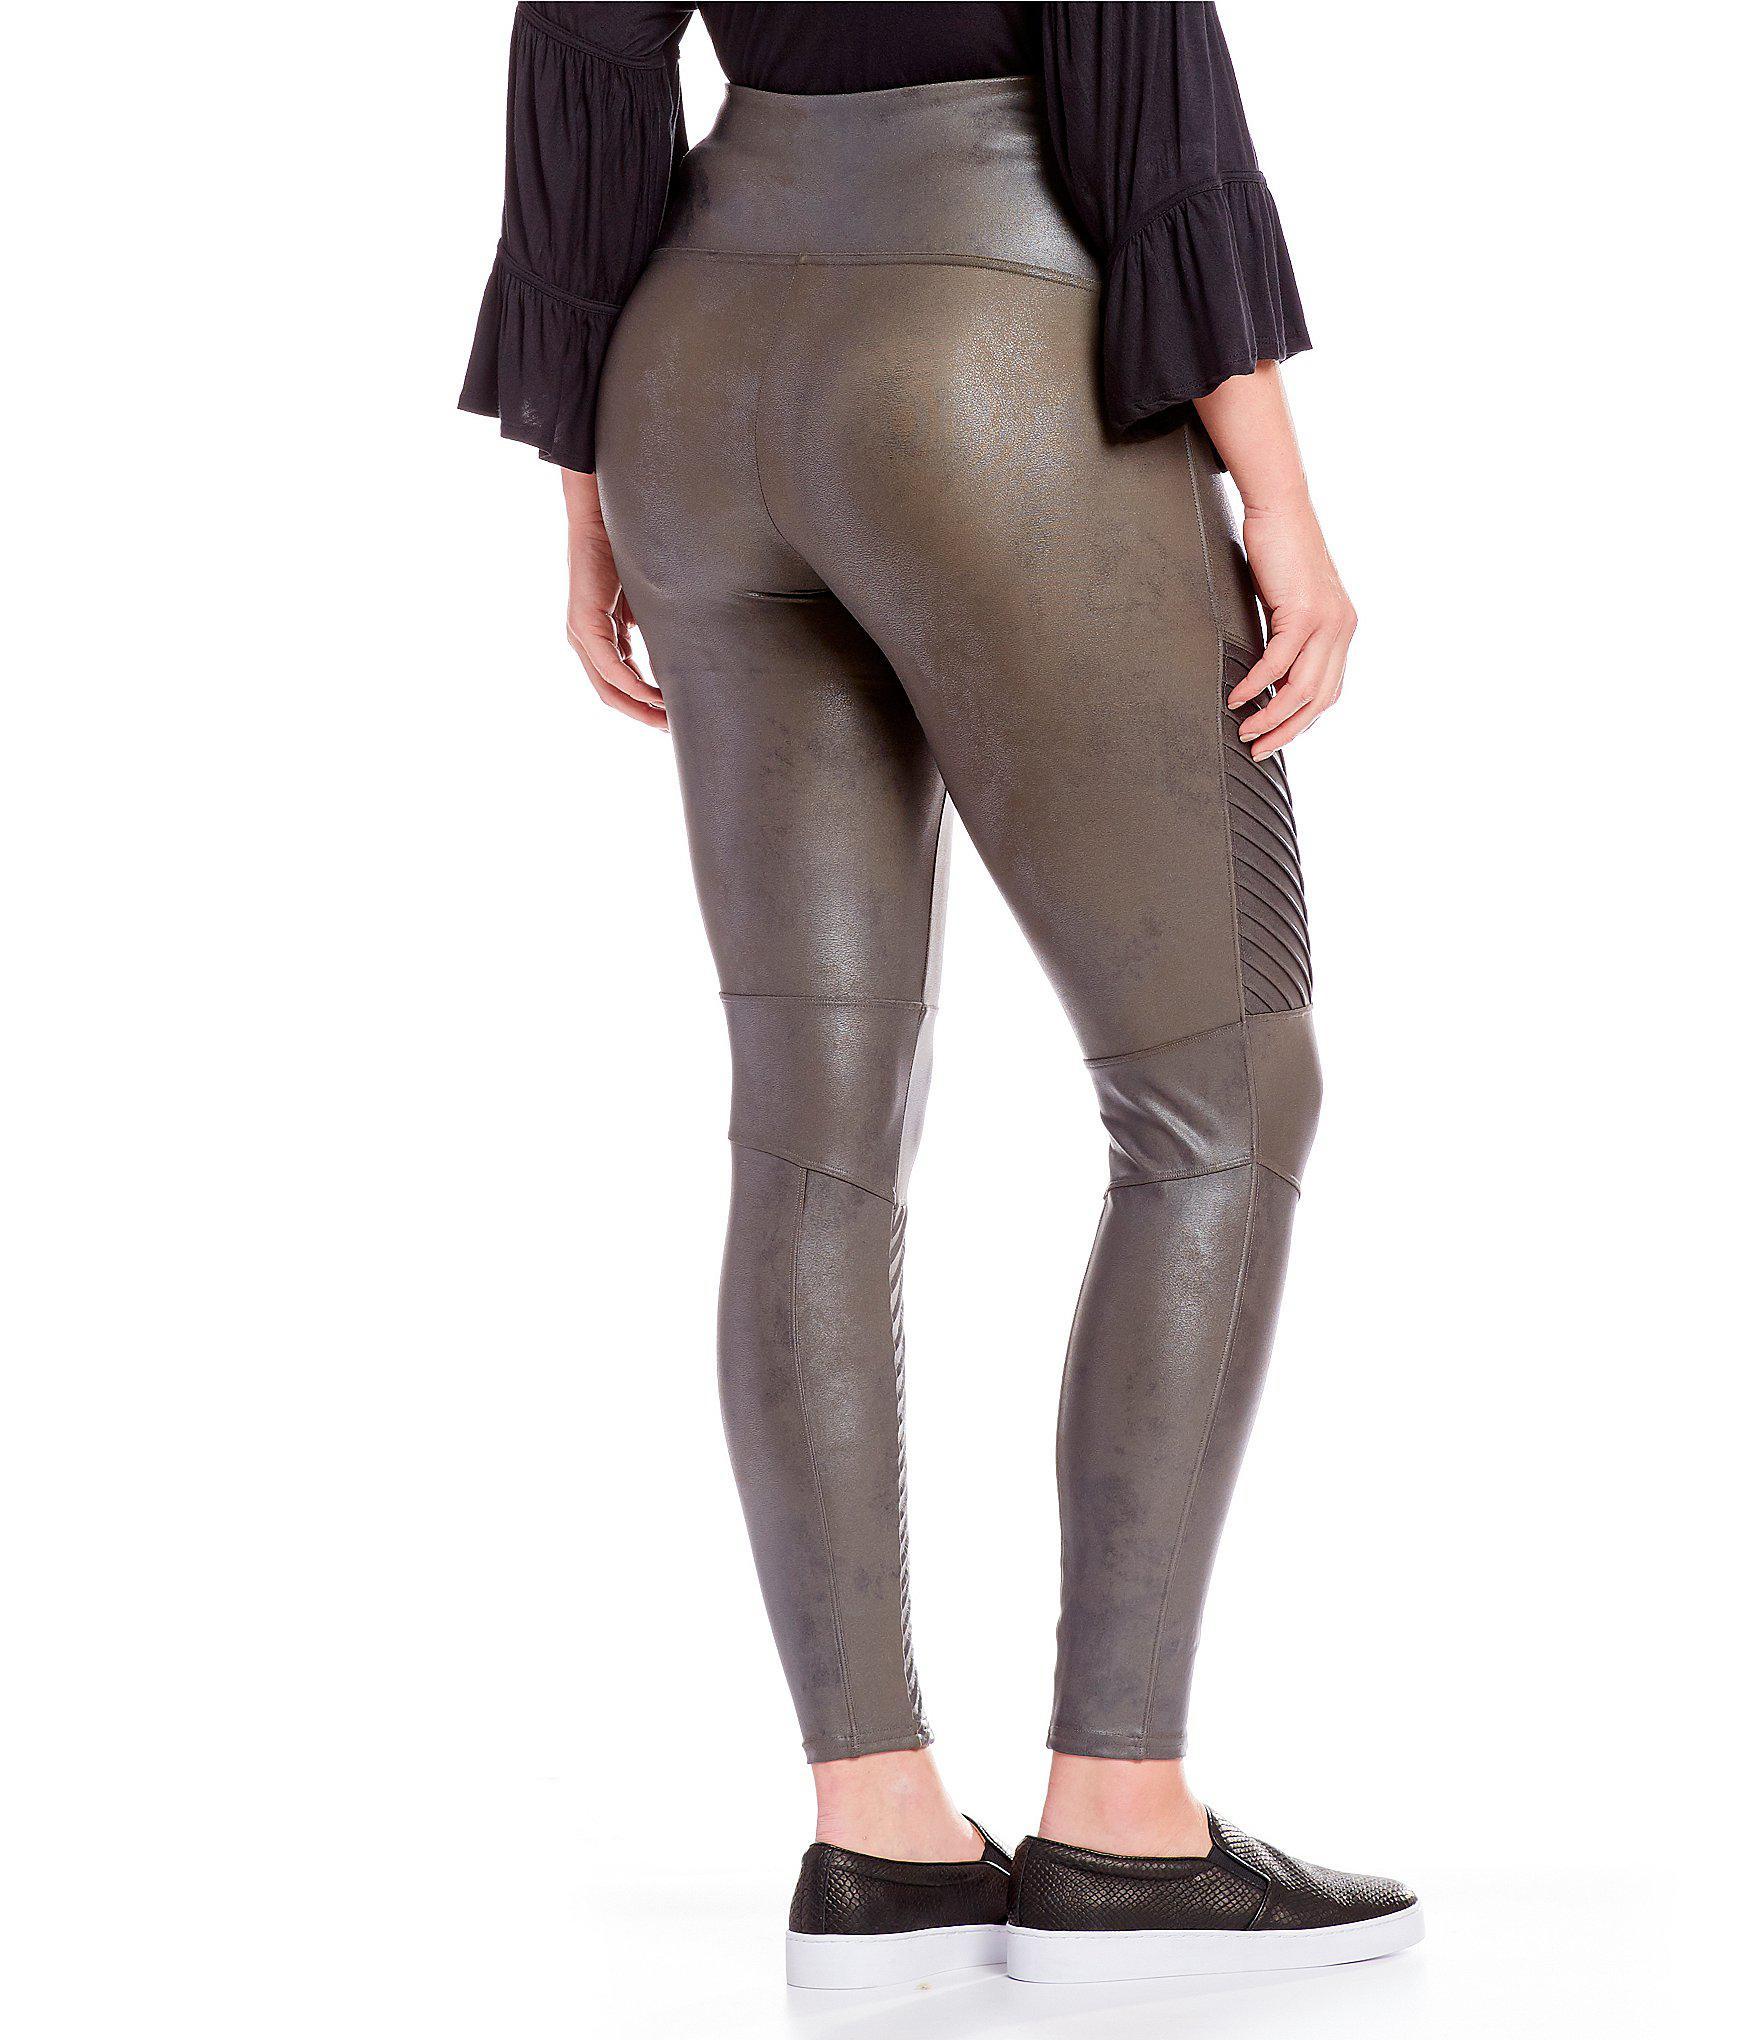 441ff2ad8ac Lyst - Spanx Plus Faux-leather Moto Leggings in Black